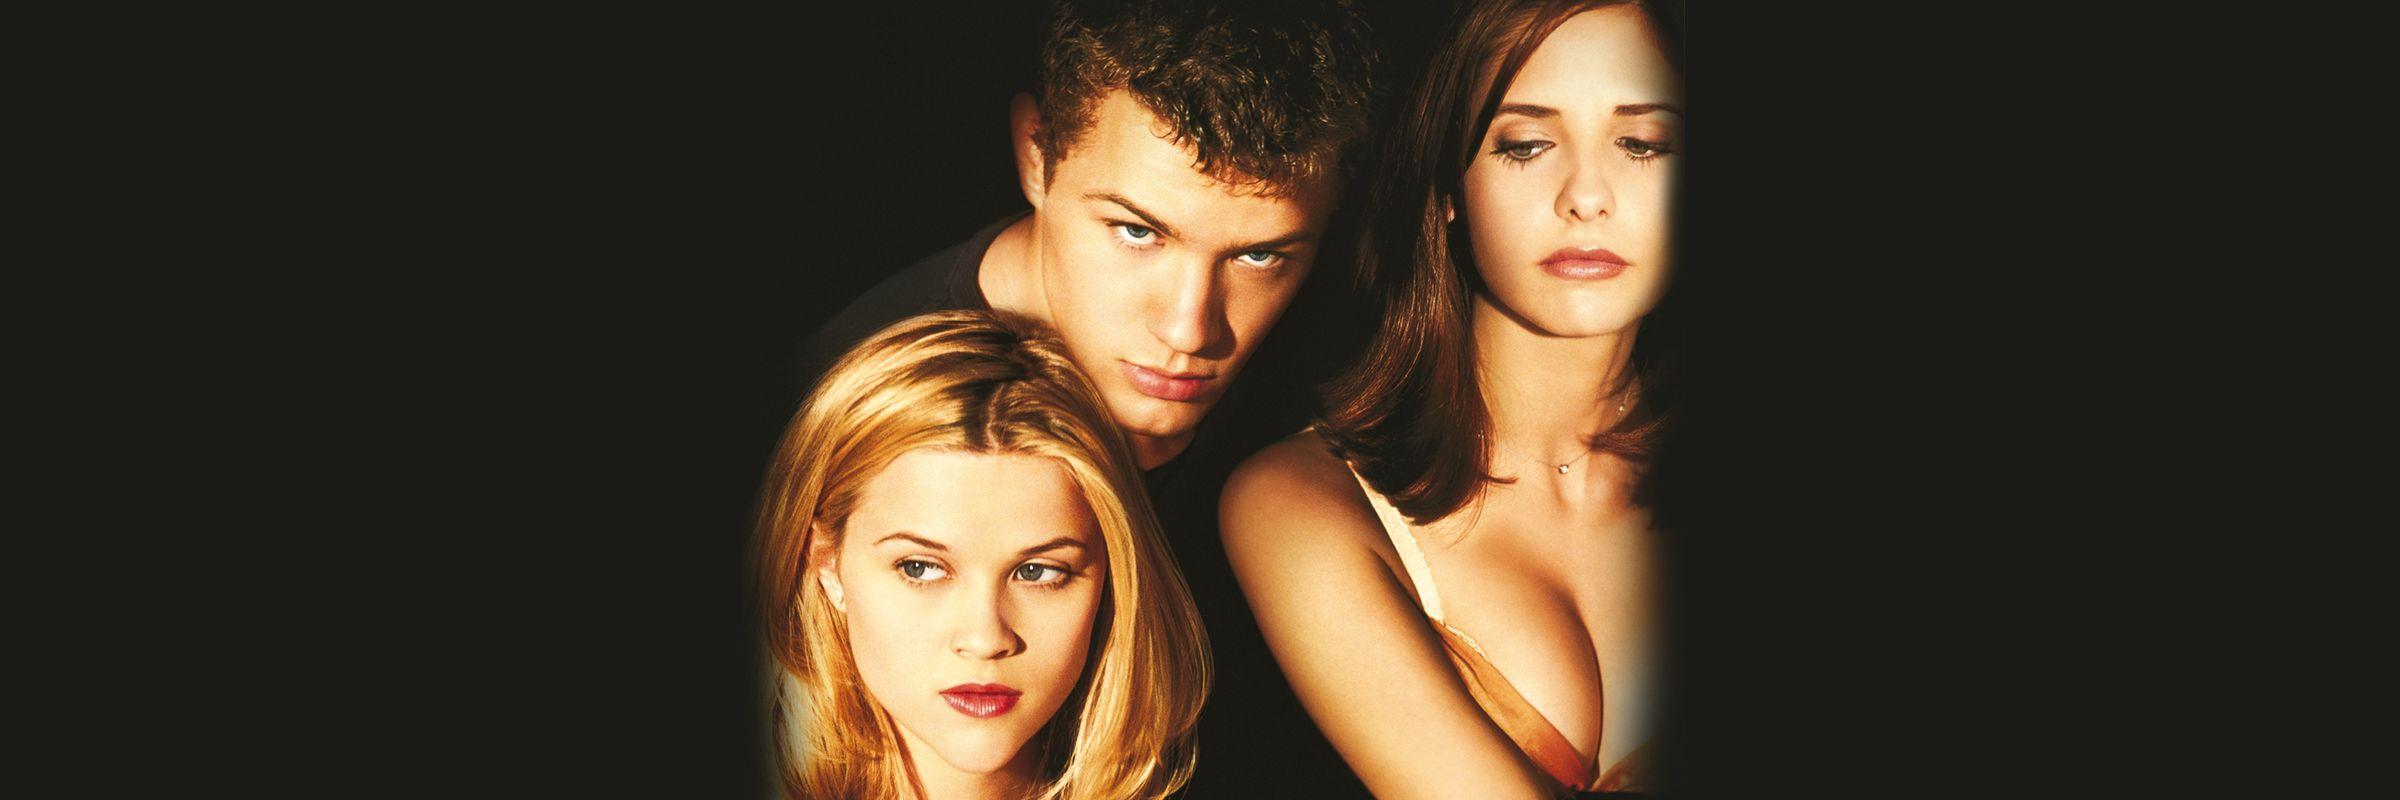 cruel intentions movie free download